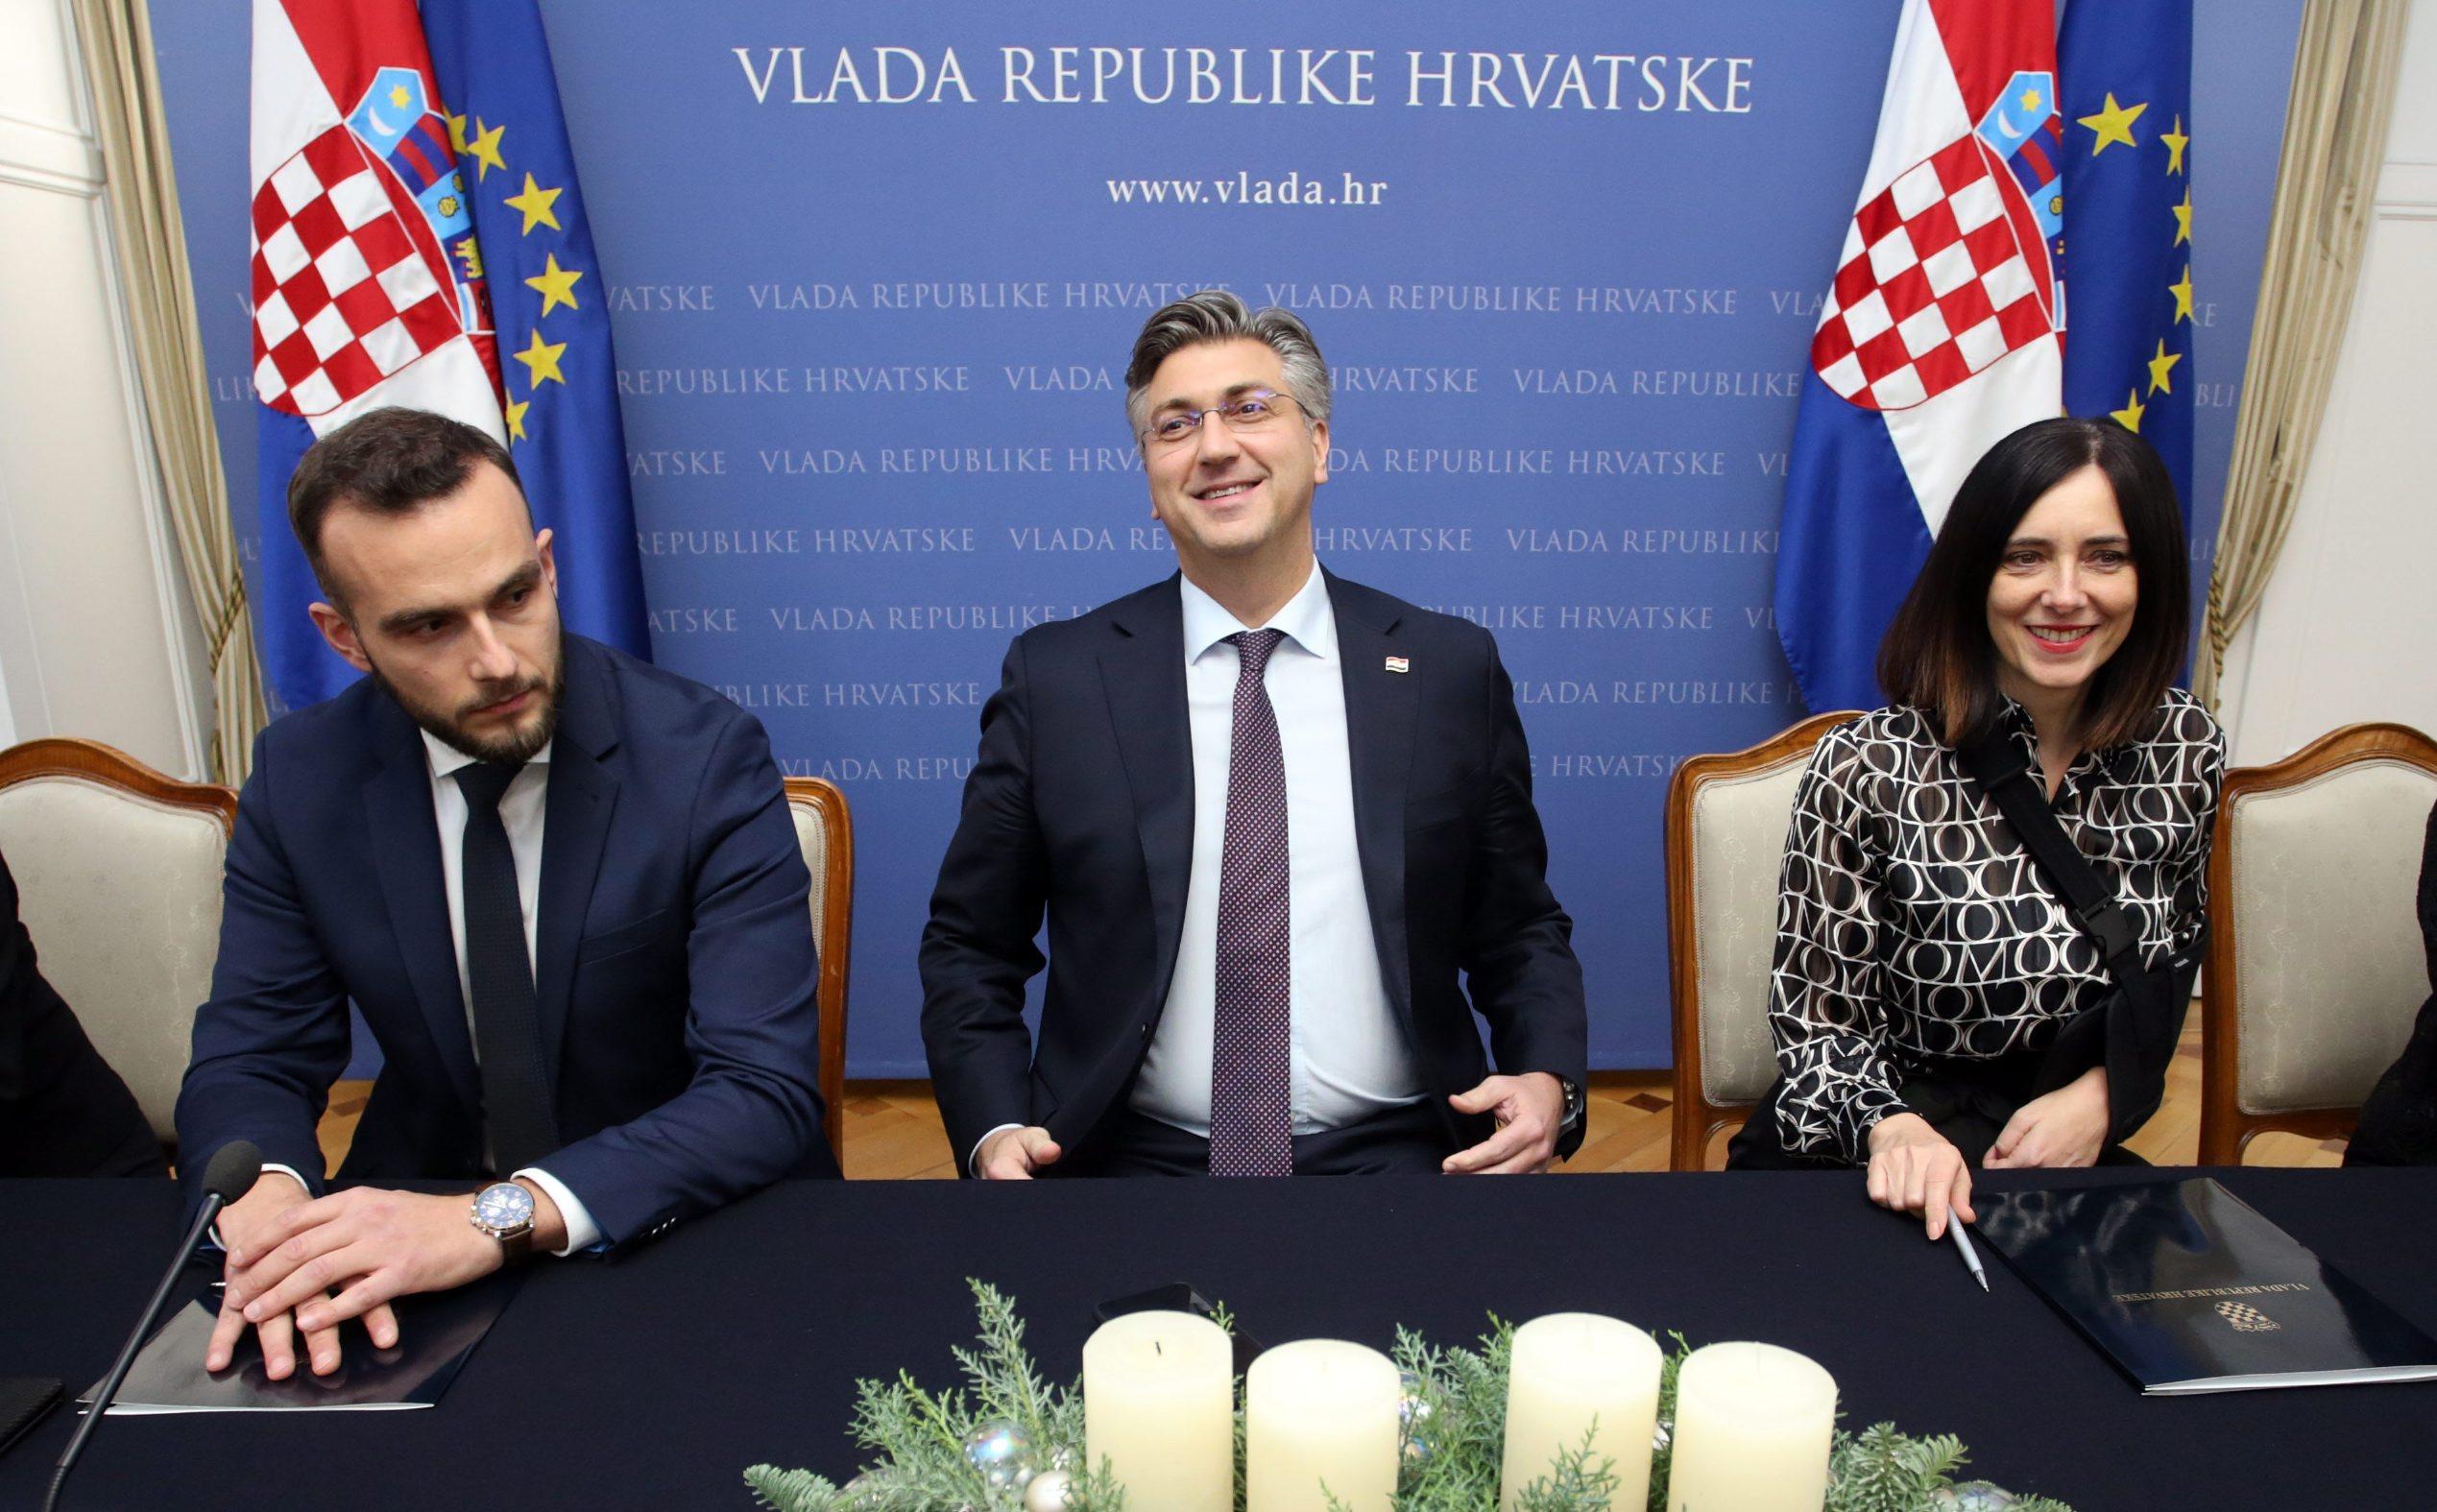 Josip Aladrović, Andrej Plenković, Blaženka Divjak